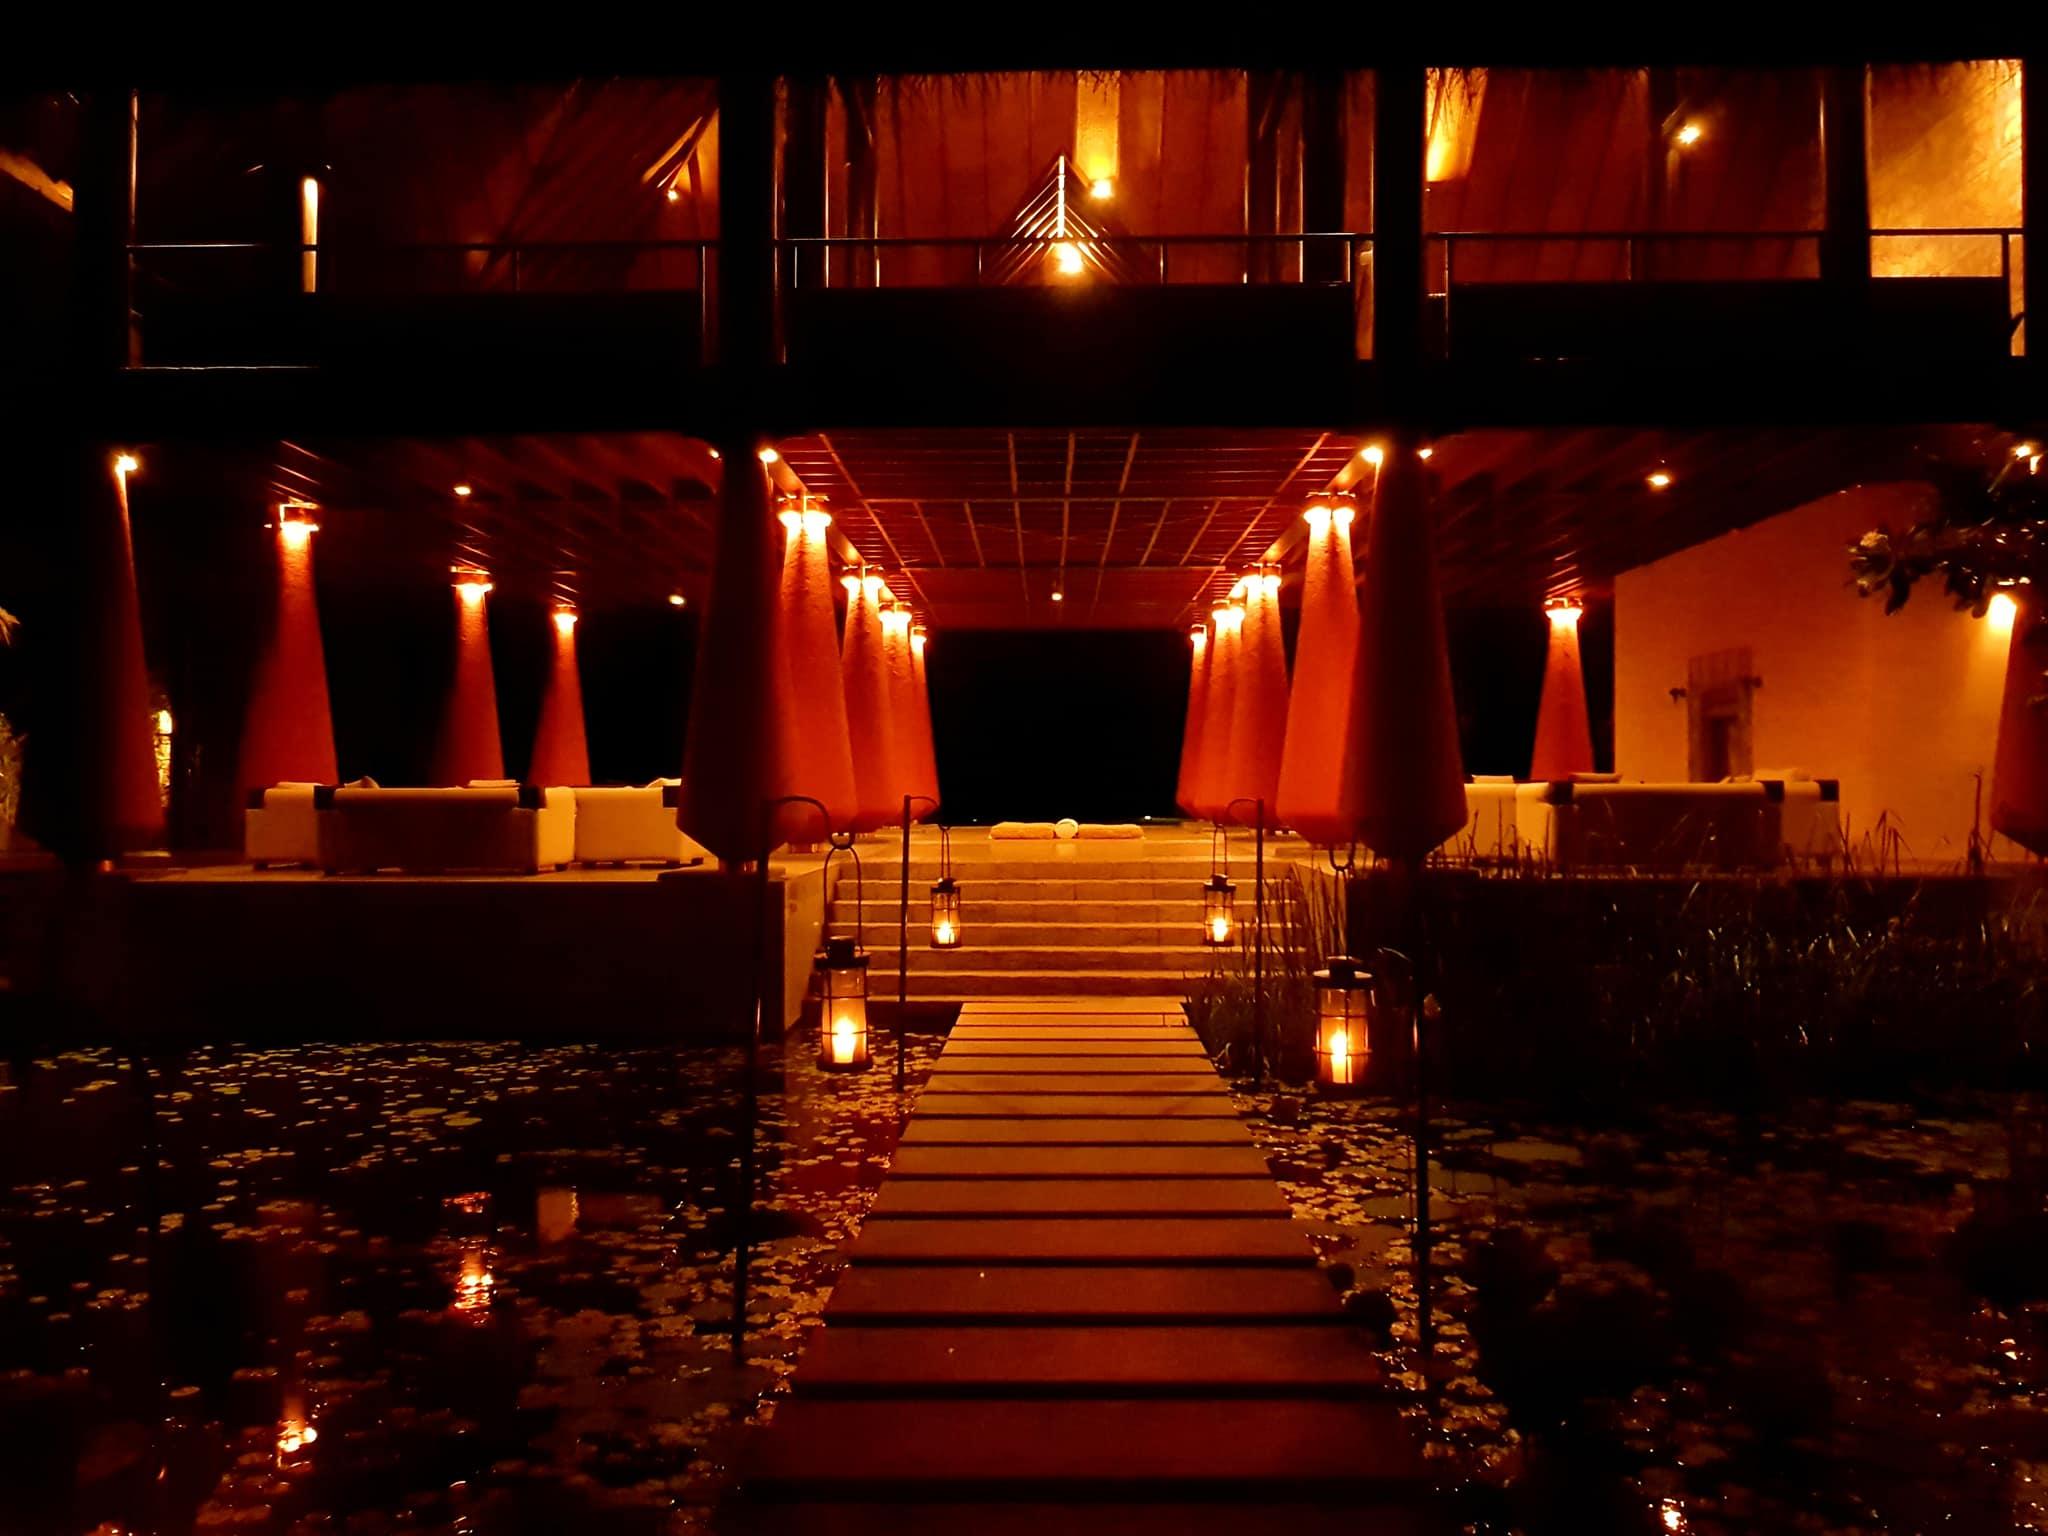 invite-to-paradise-sri-lanka-maldives-holiday-honeymoon-specialists-customer-guest-feedback-zane-lisa-butcher-jetwing-vil-uyana-hotel-sigiriya-cultural-triangle-night.jpg